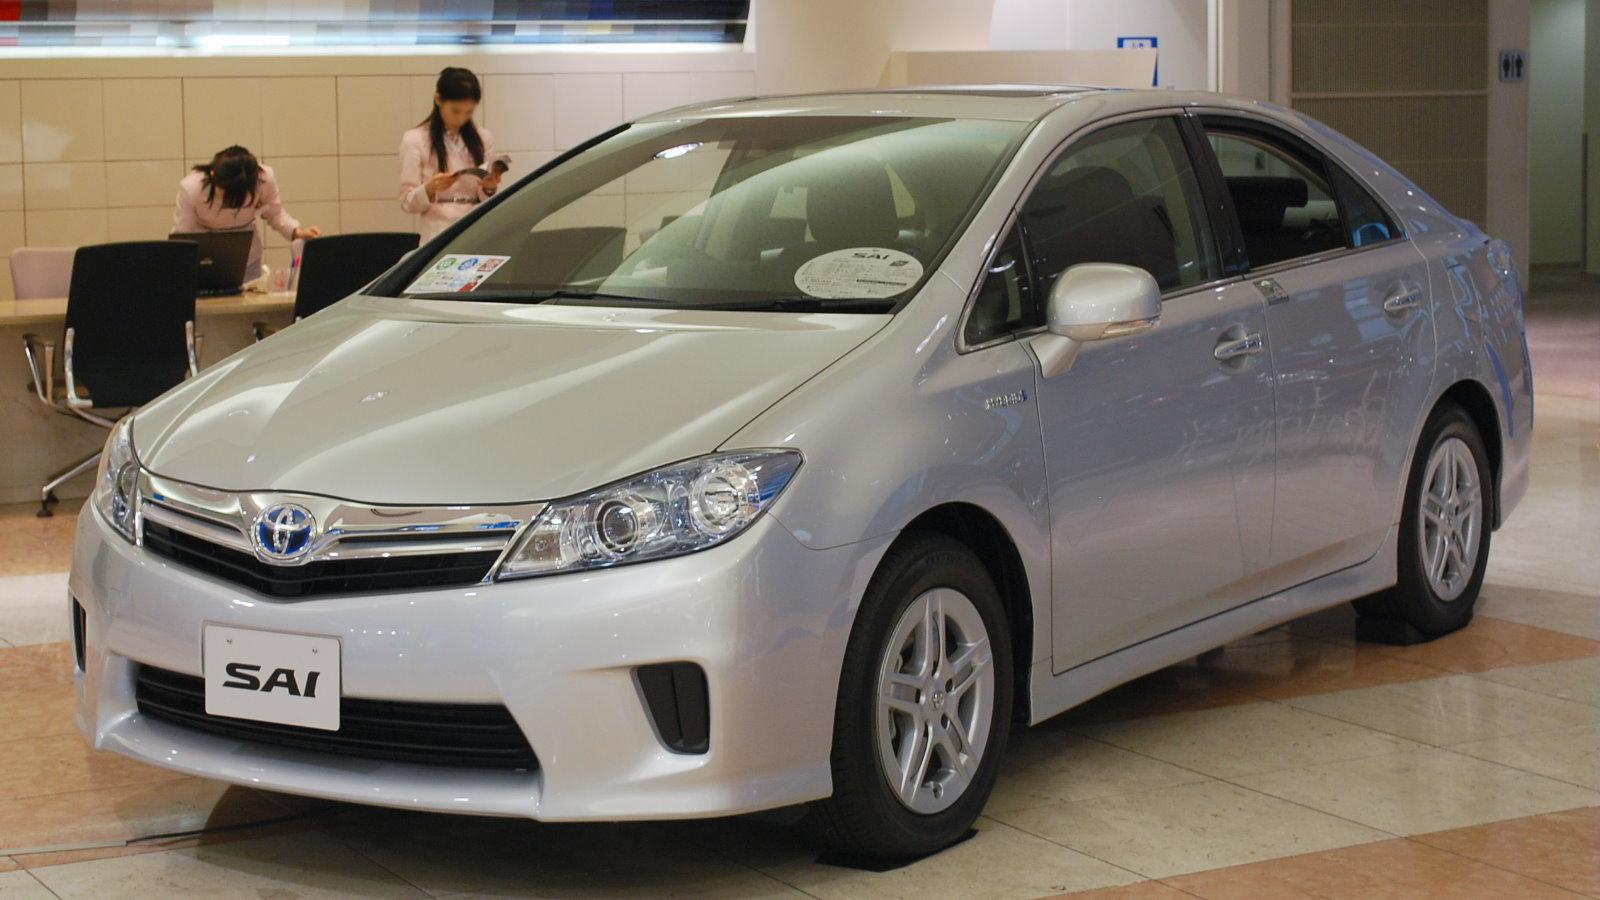 2009_Toyota_SAI_01.jpg